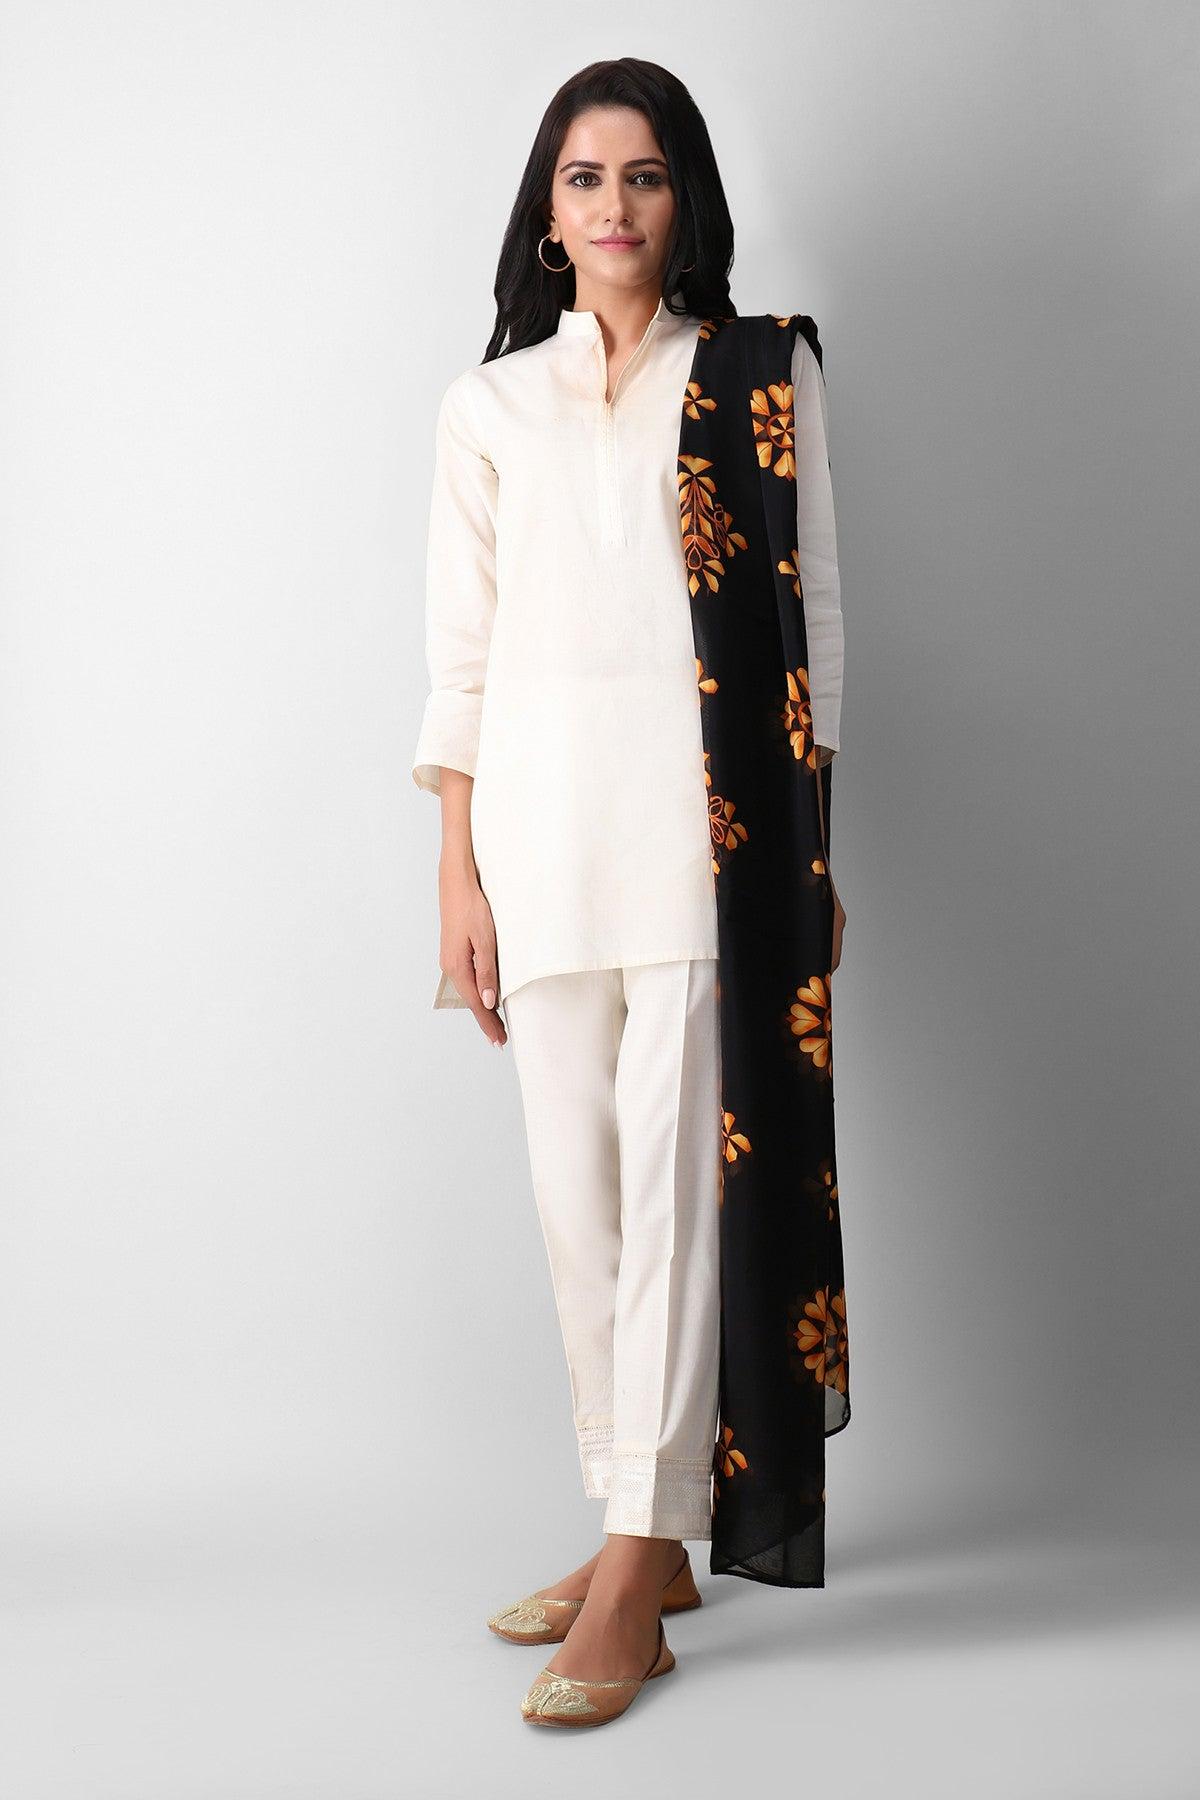 Khaadi Esdp21206 Black Ready to Wear 2021